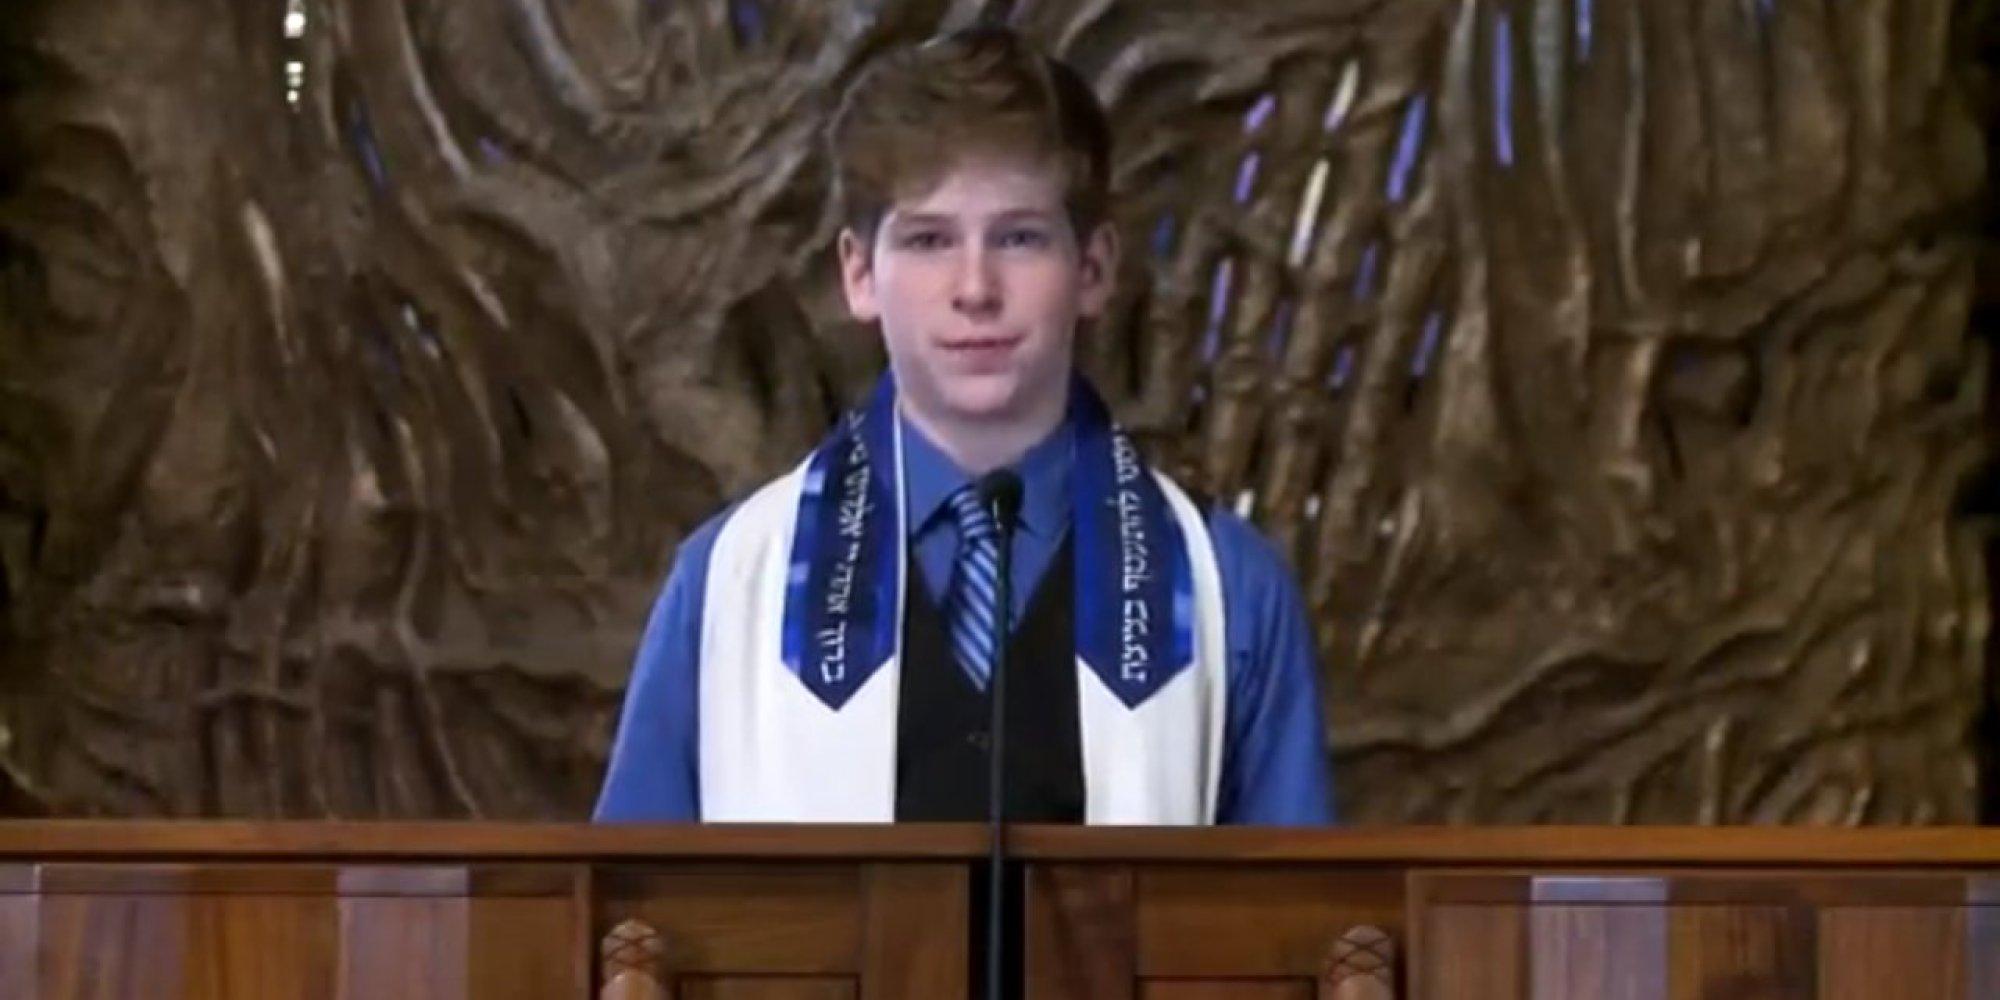 from Trey pro gay marriage speech